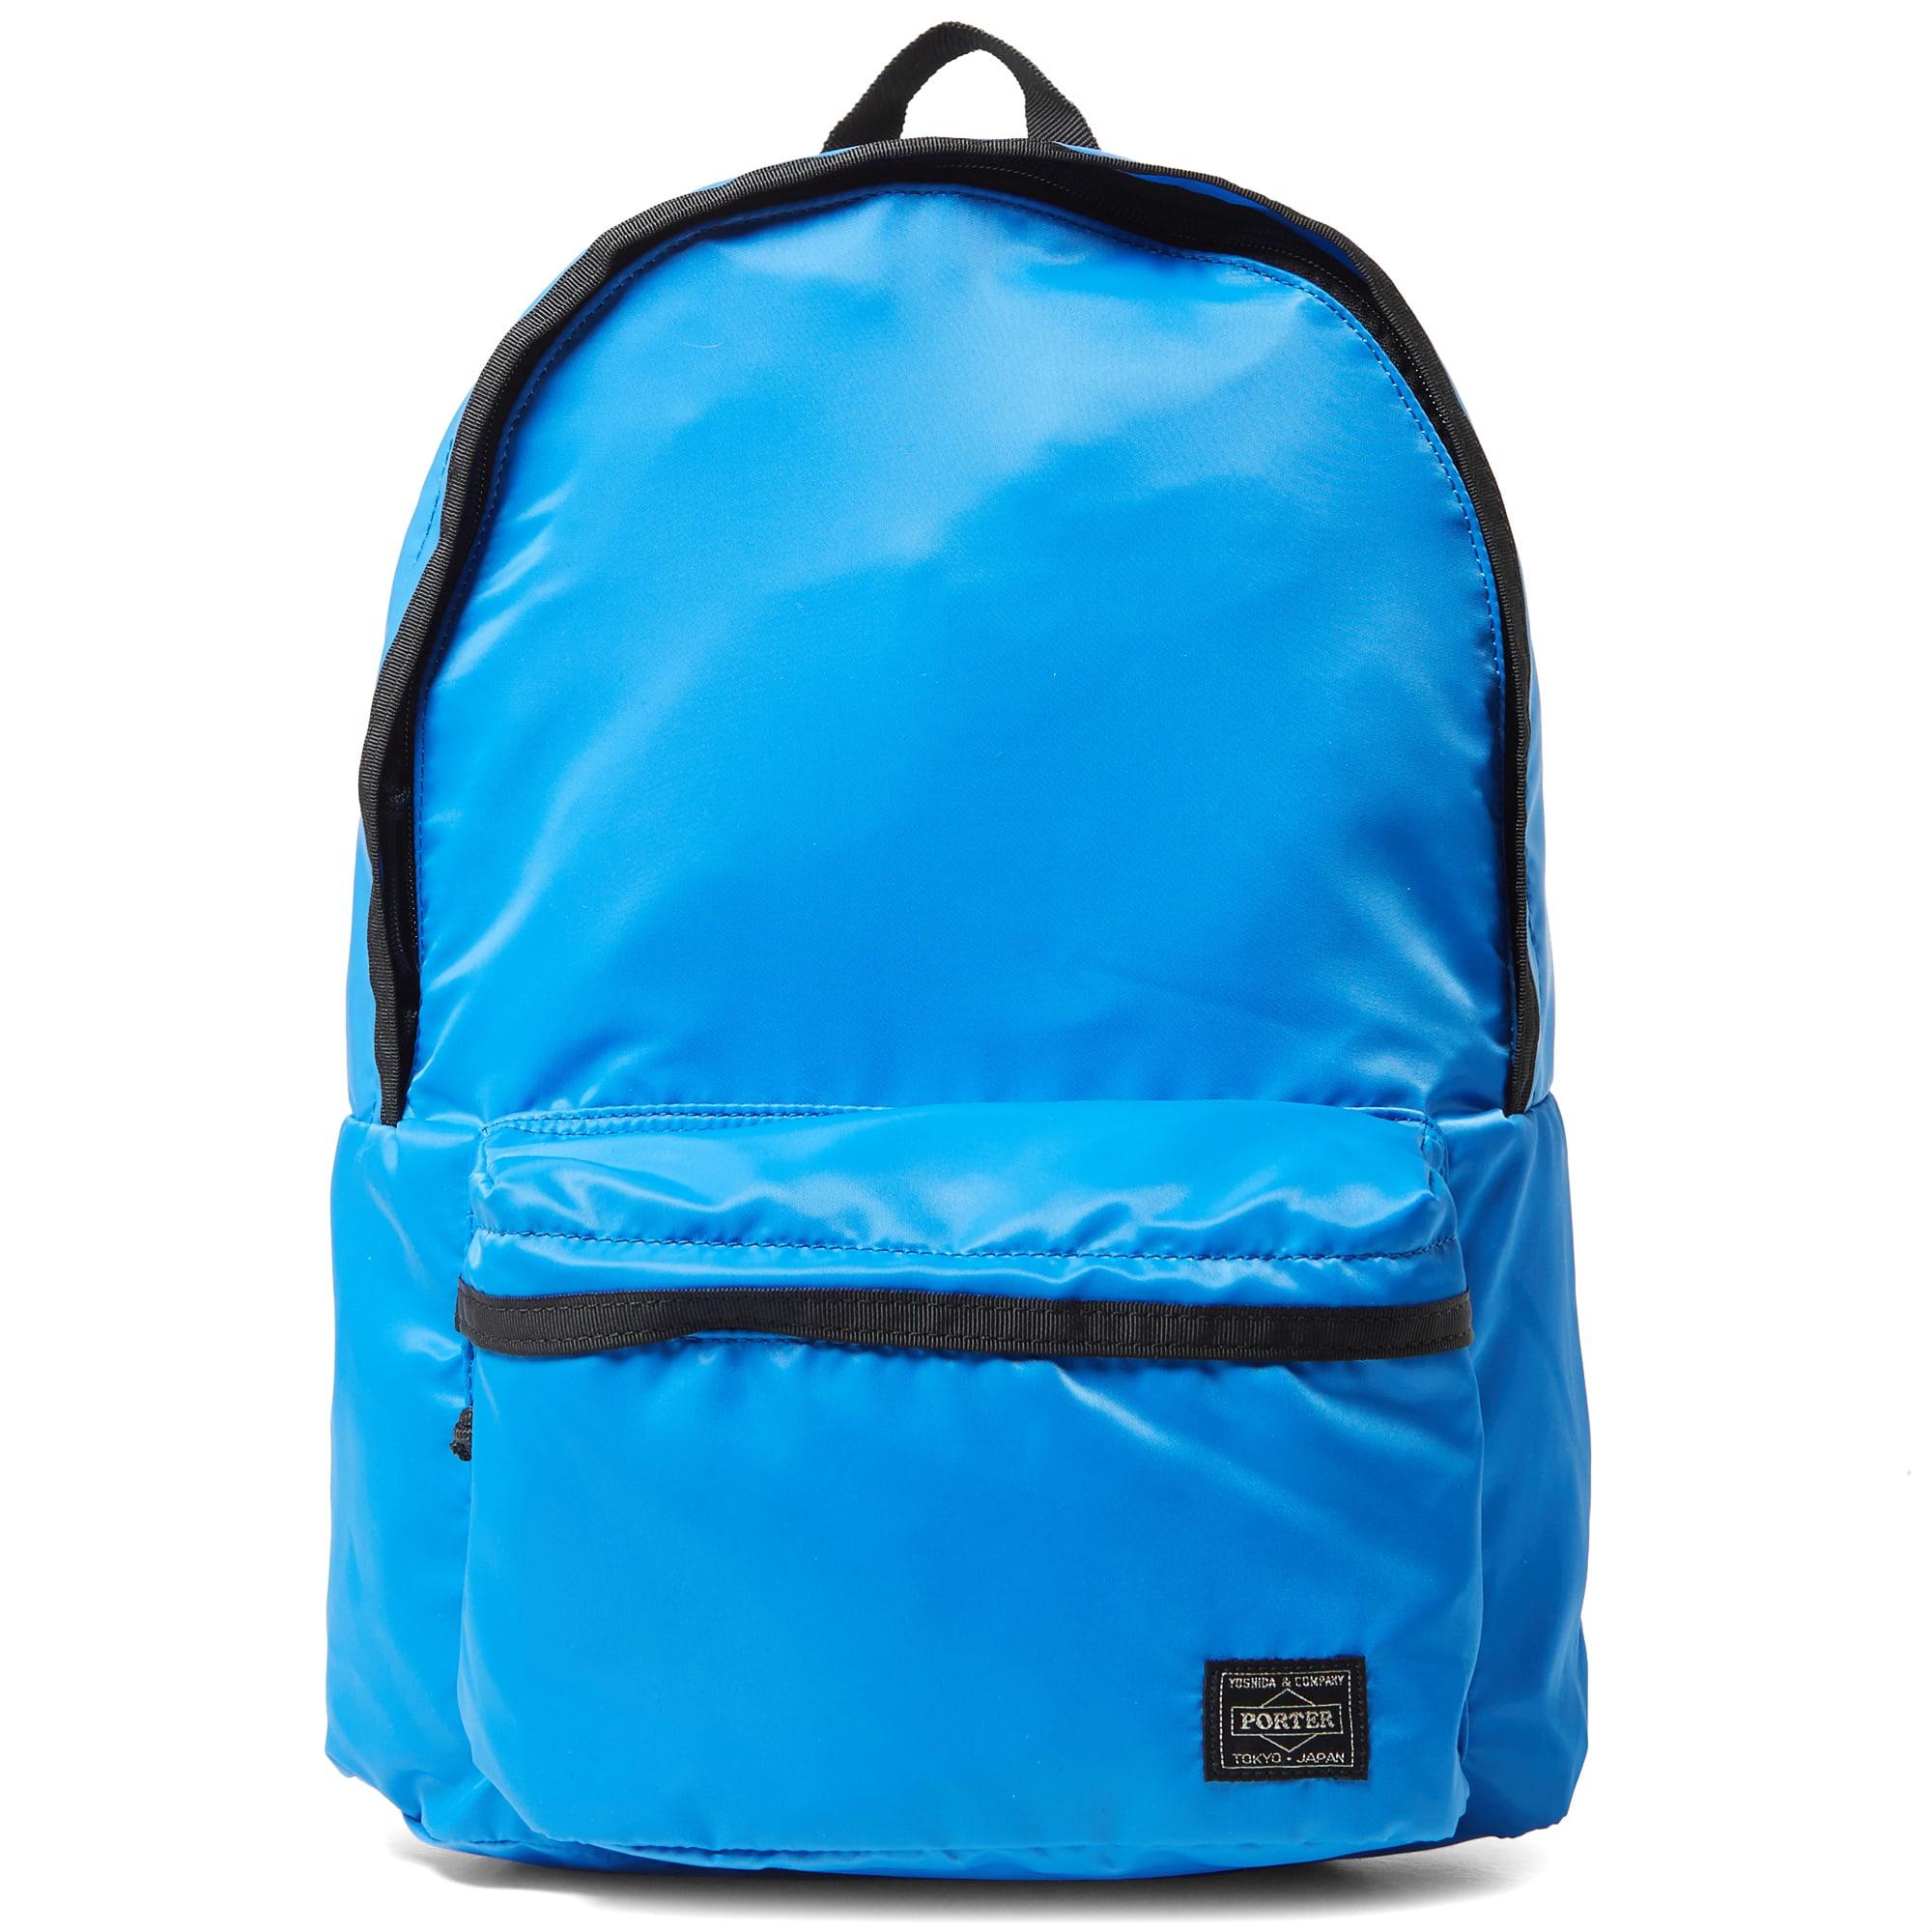 PORTER-YOSHIDA & CO Porter-Yoshida & Co. Signal Daypack in Blue